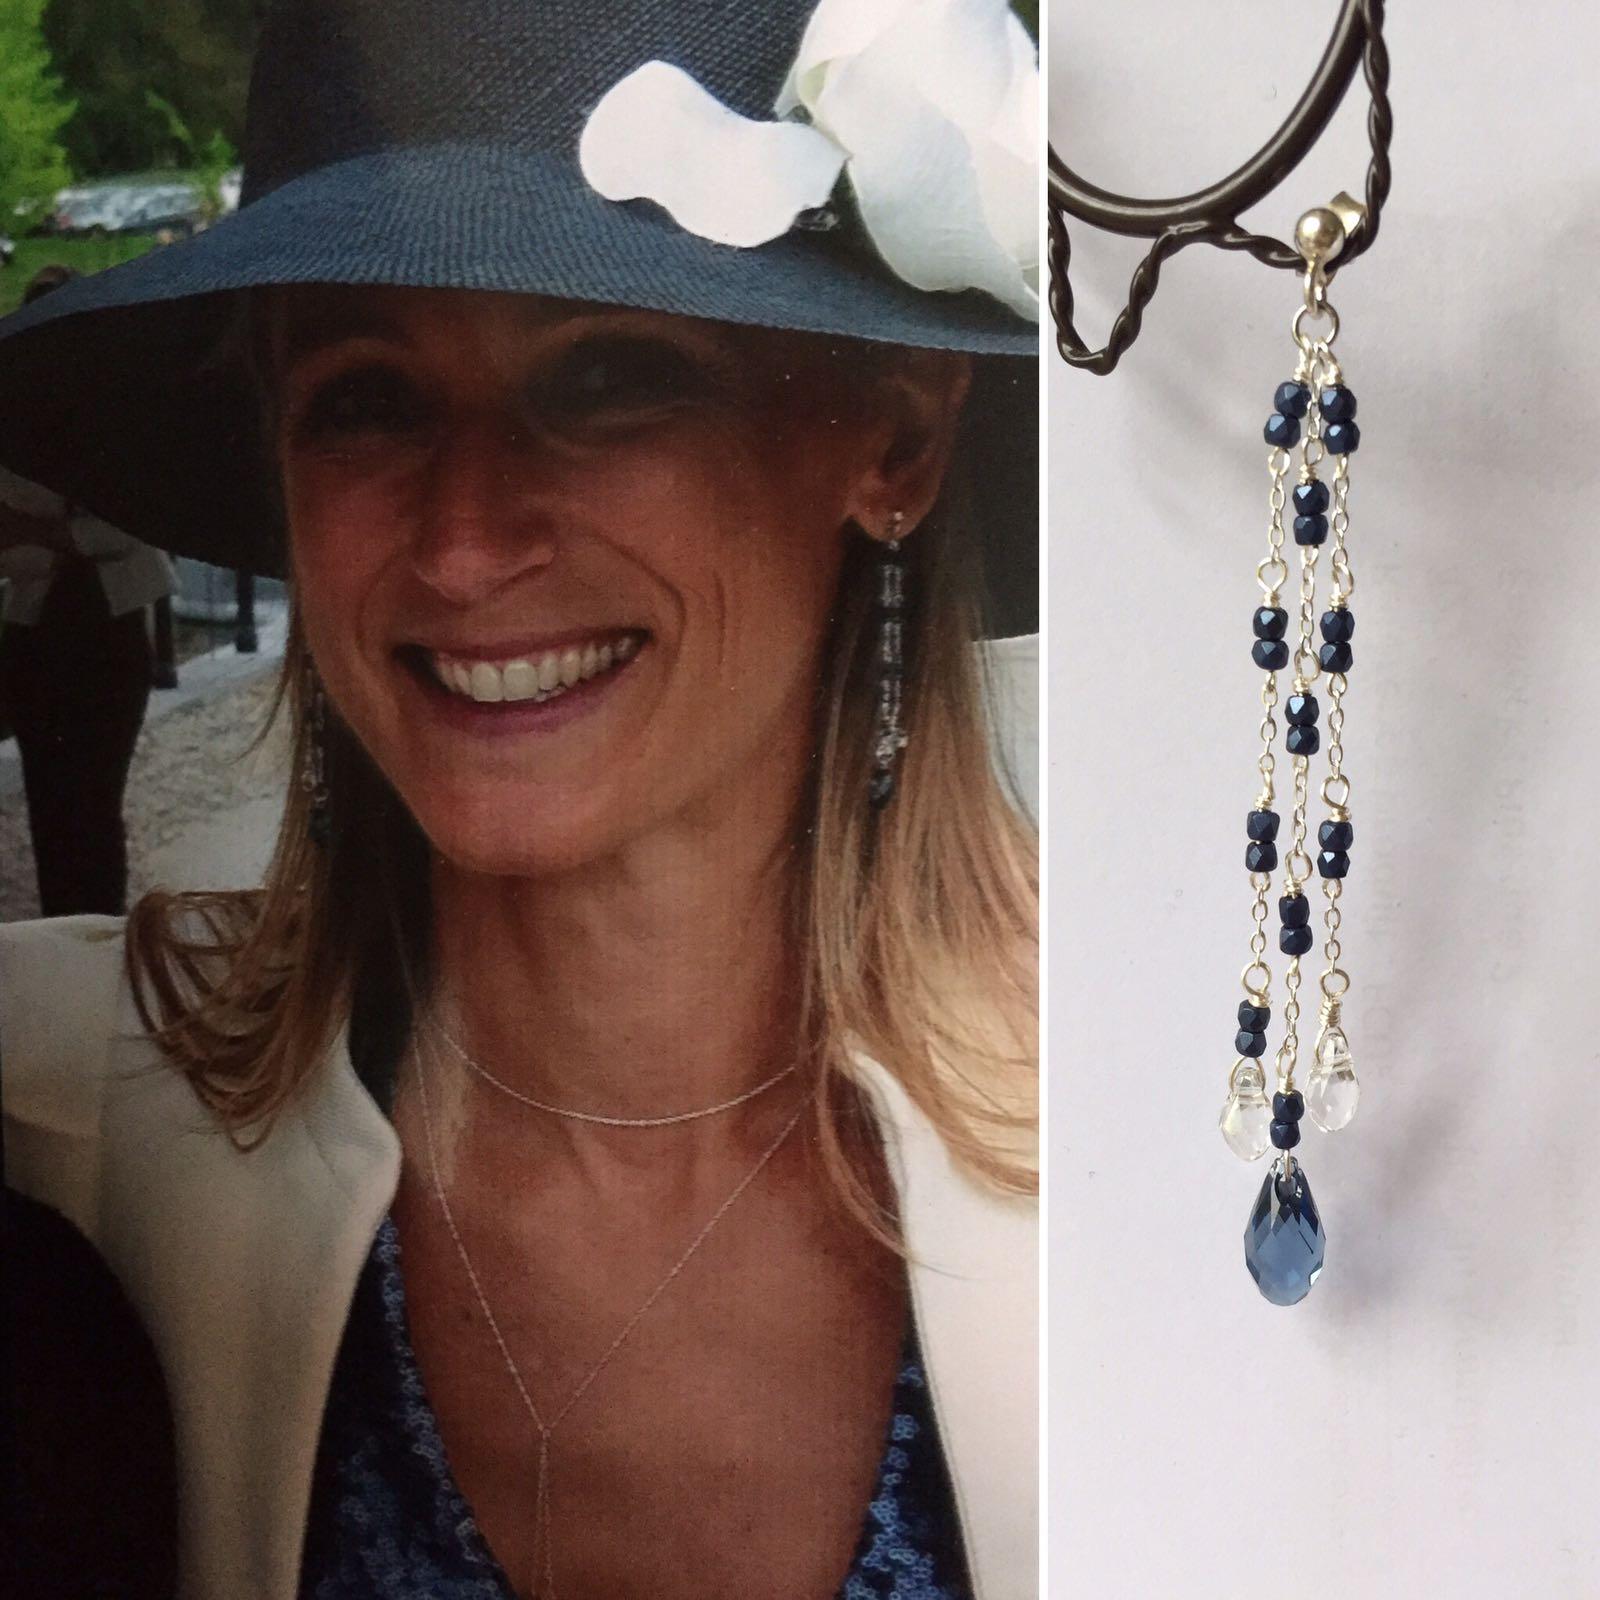 Les bijoux d'Oriane